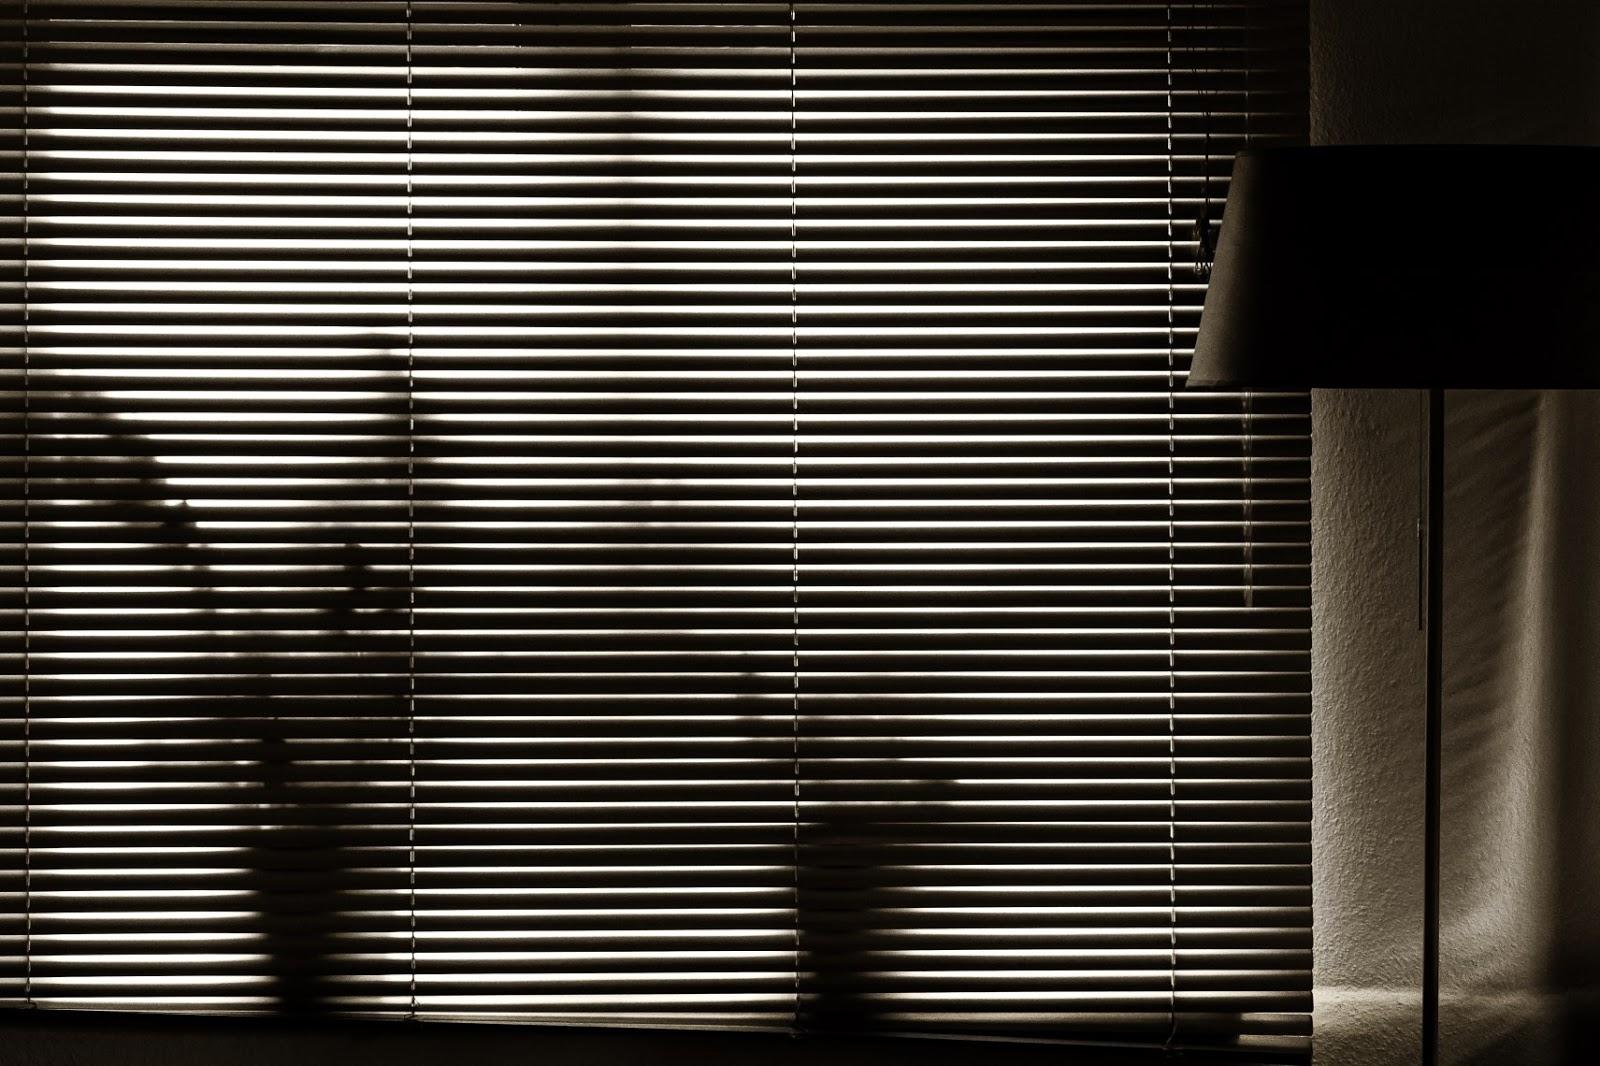 Matthew g beall photography plants window blind lamp 2014